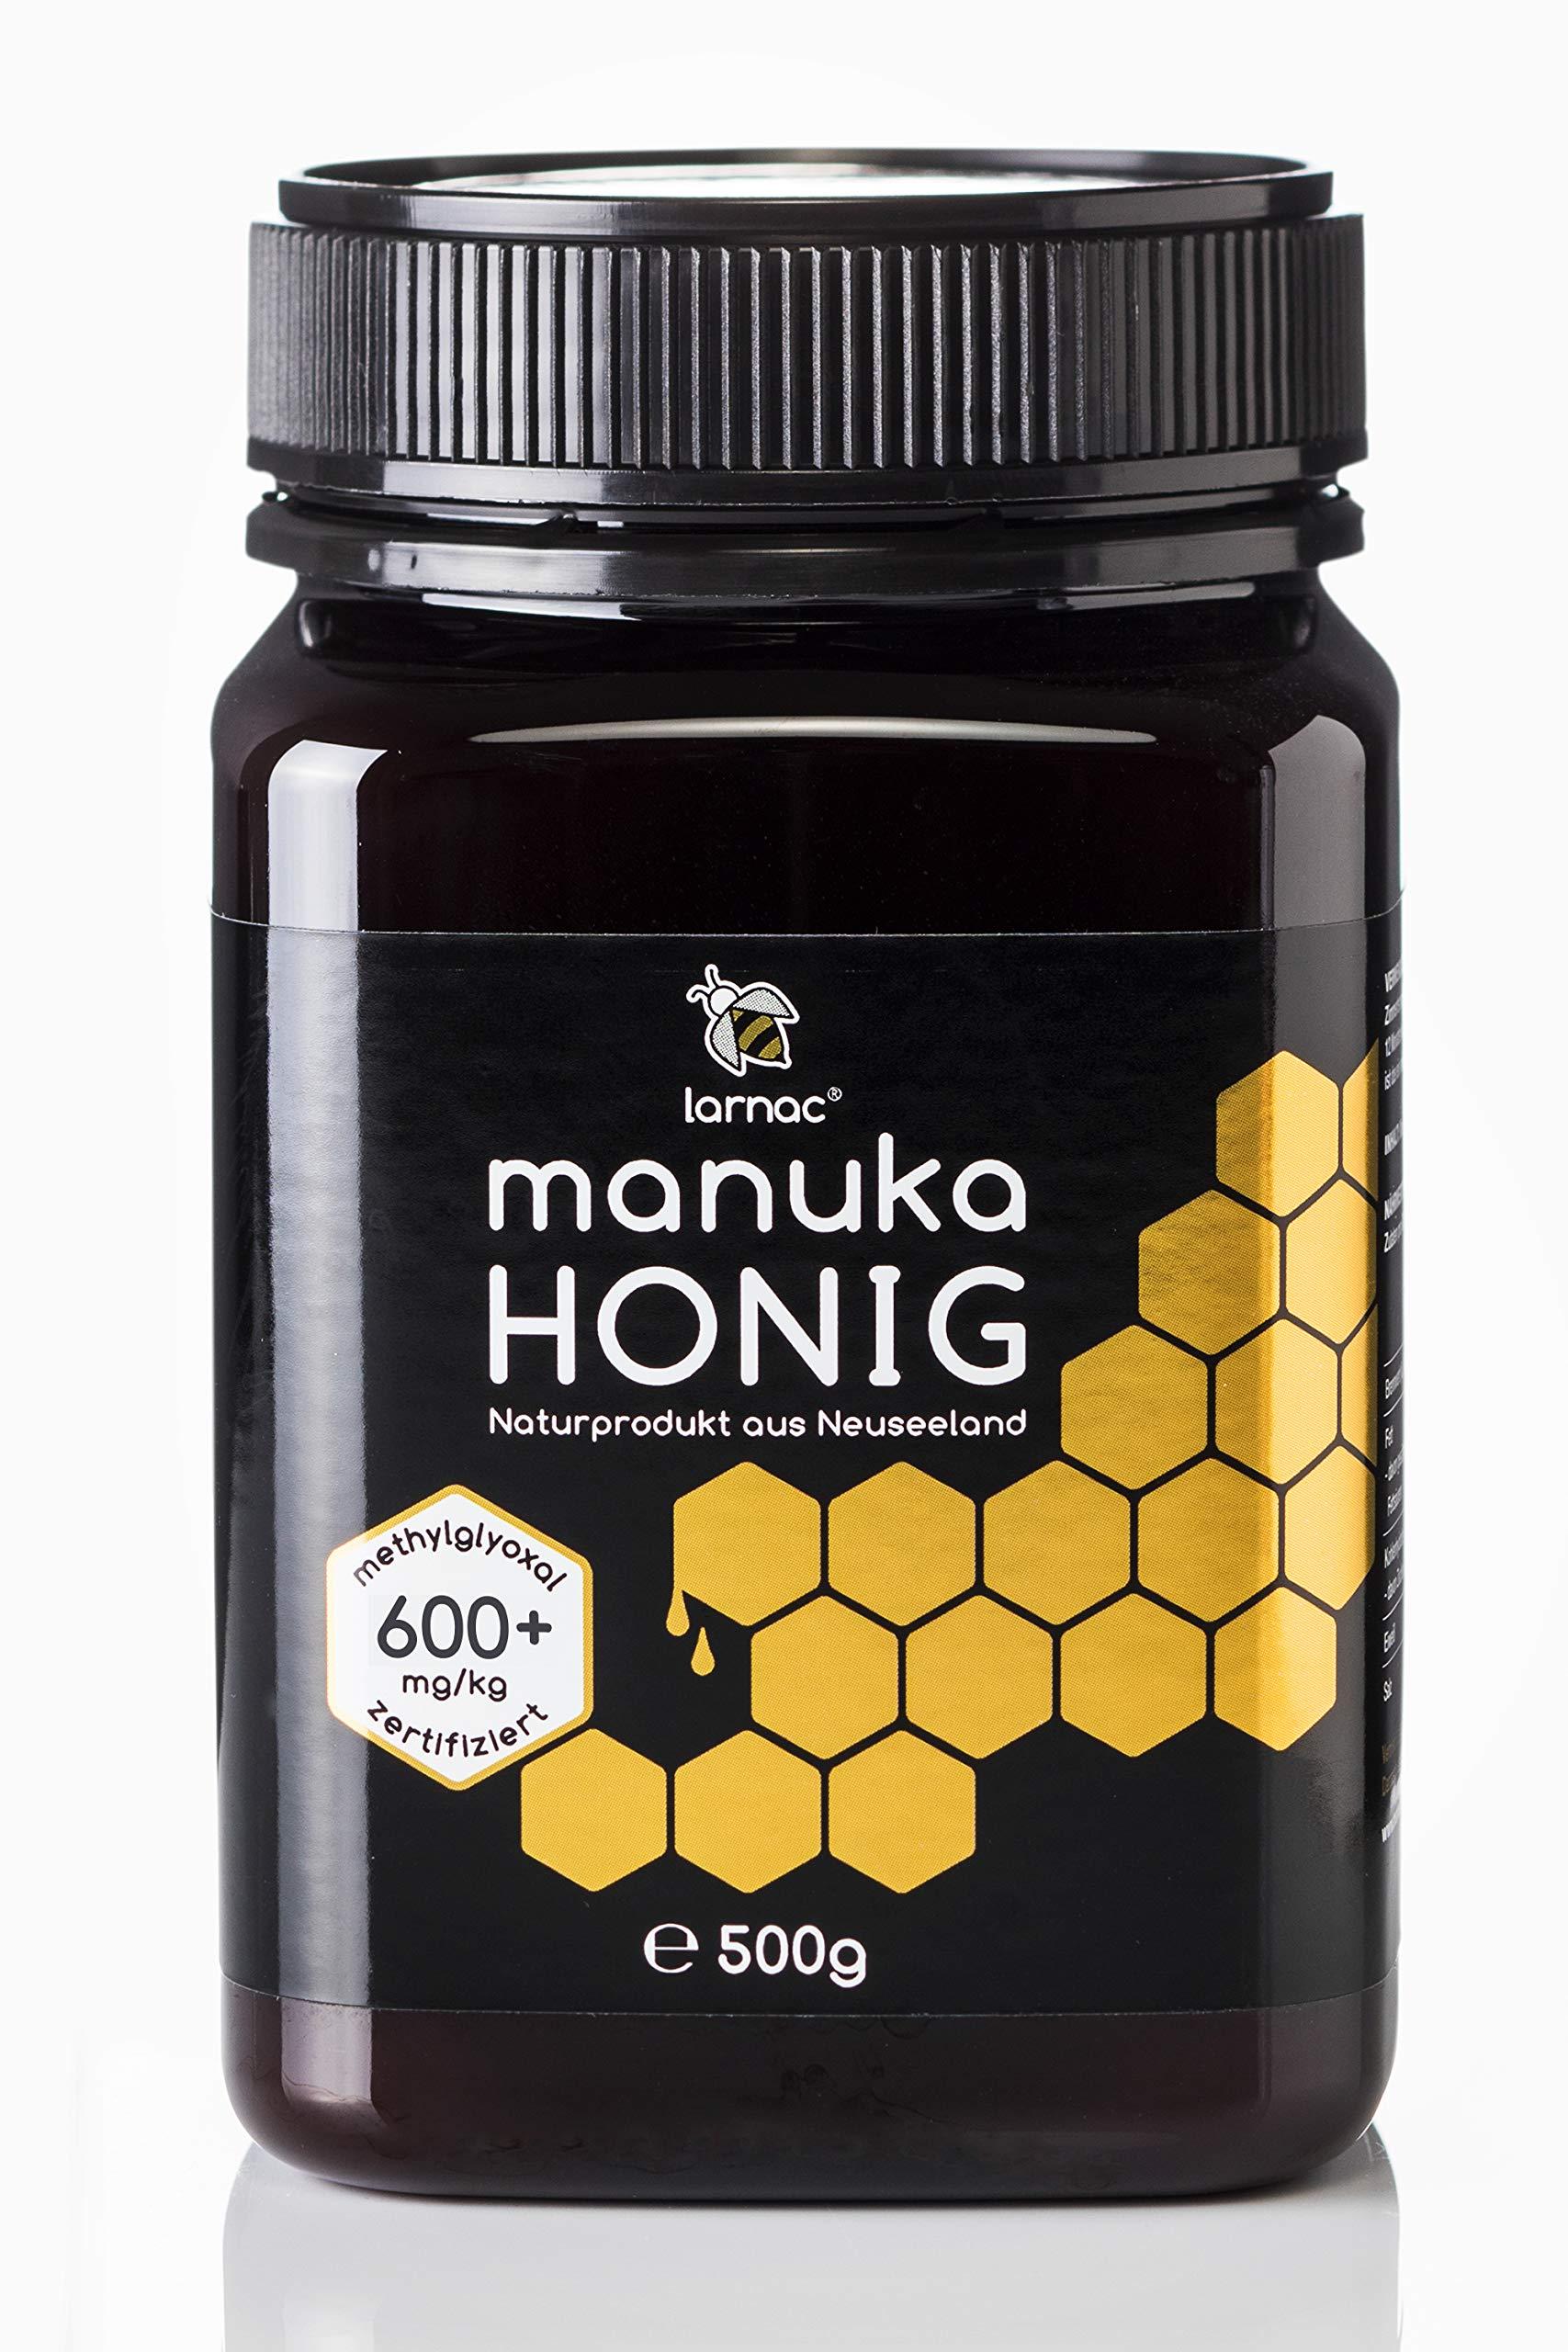 Larnac Manuka Honig 600+ MGO aus Neuseeland, 500g, zertifizierter Methylglyoxalgehalt Bild